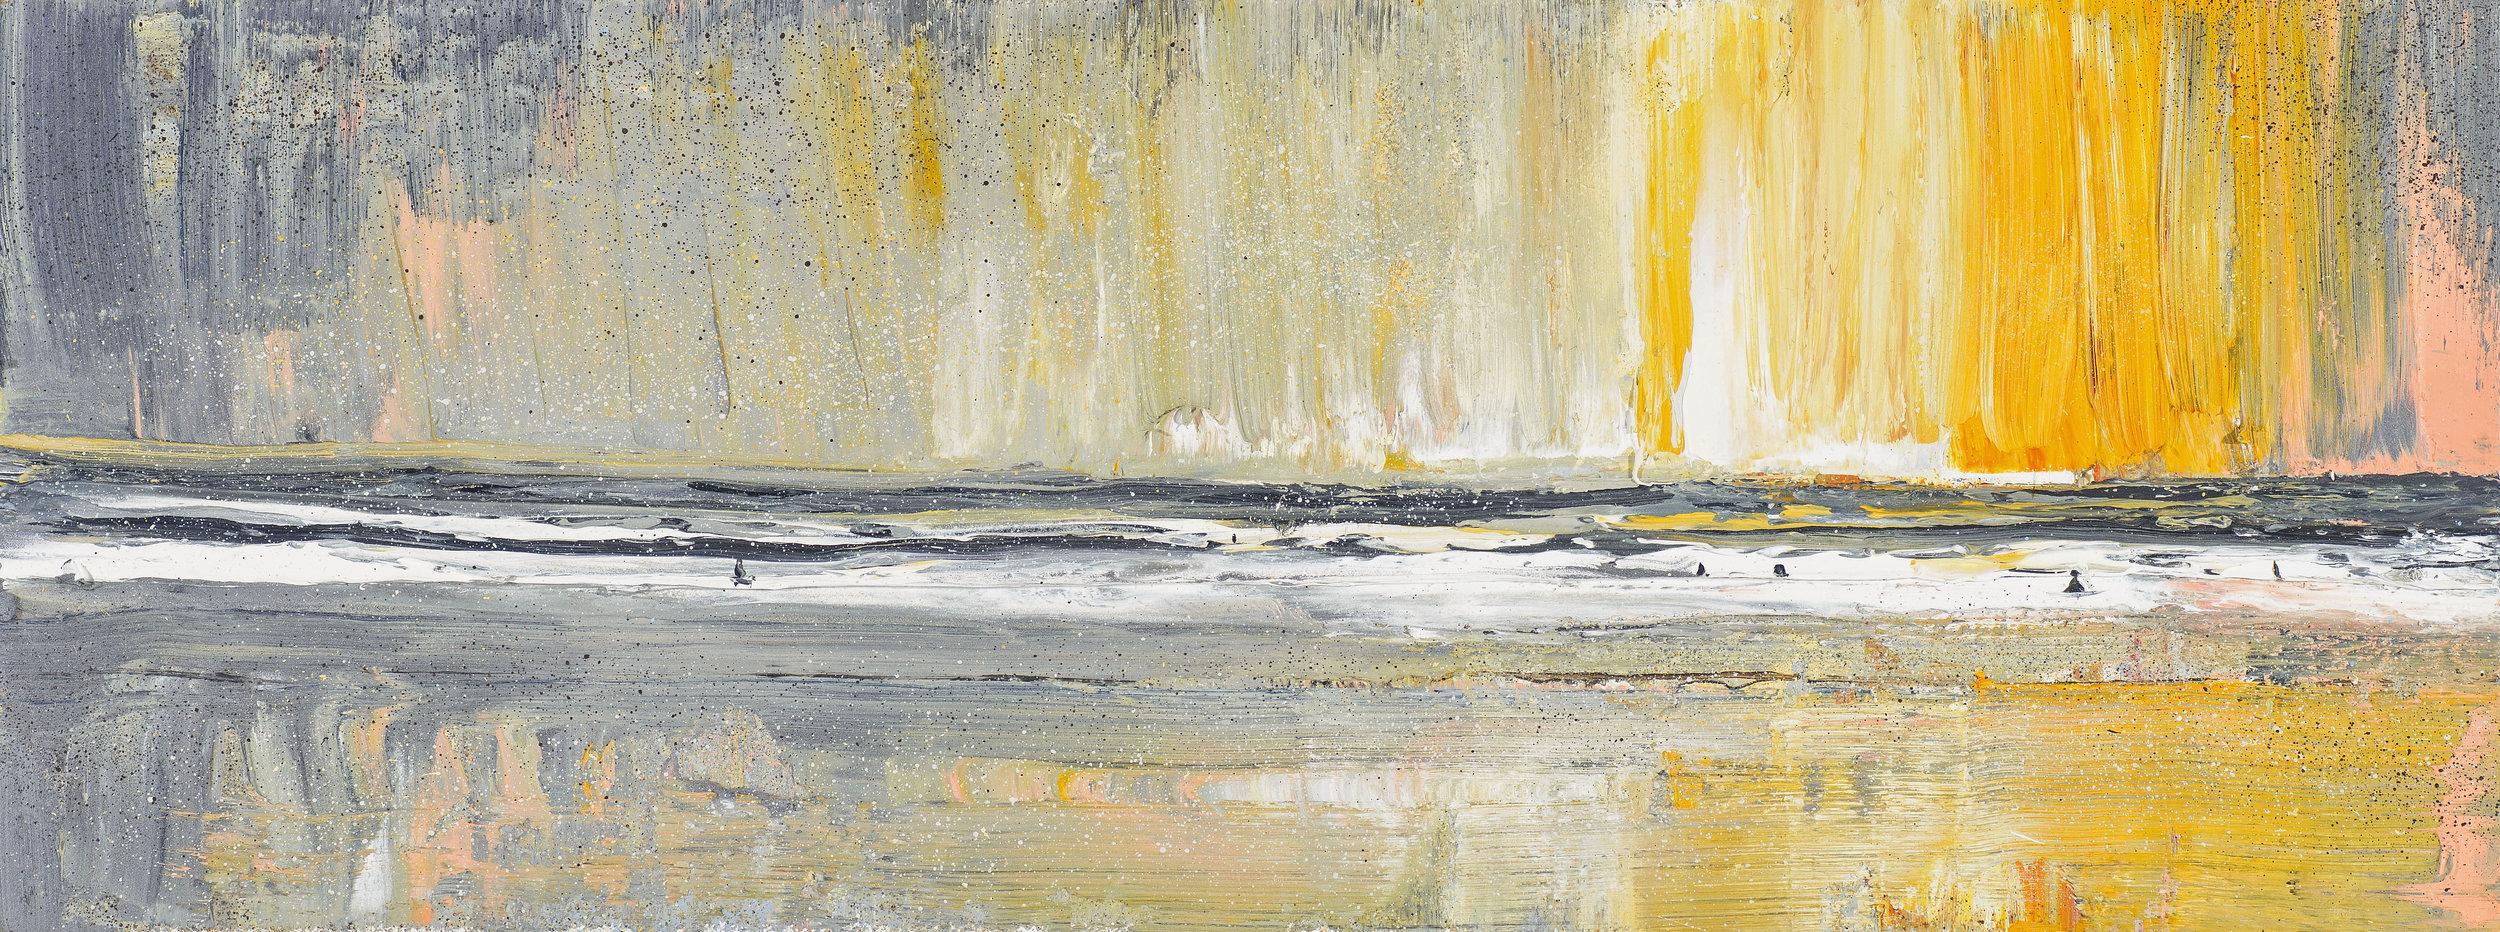 Last hours of light Polzeath. Oil on canvas. 40x15cm. £850 inc vat .jpg